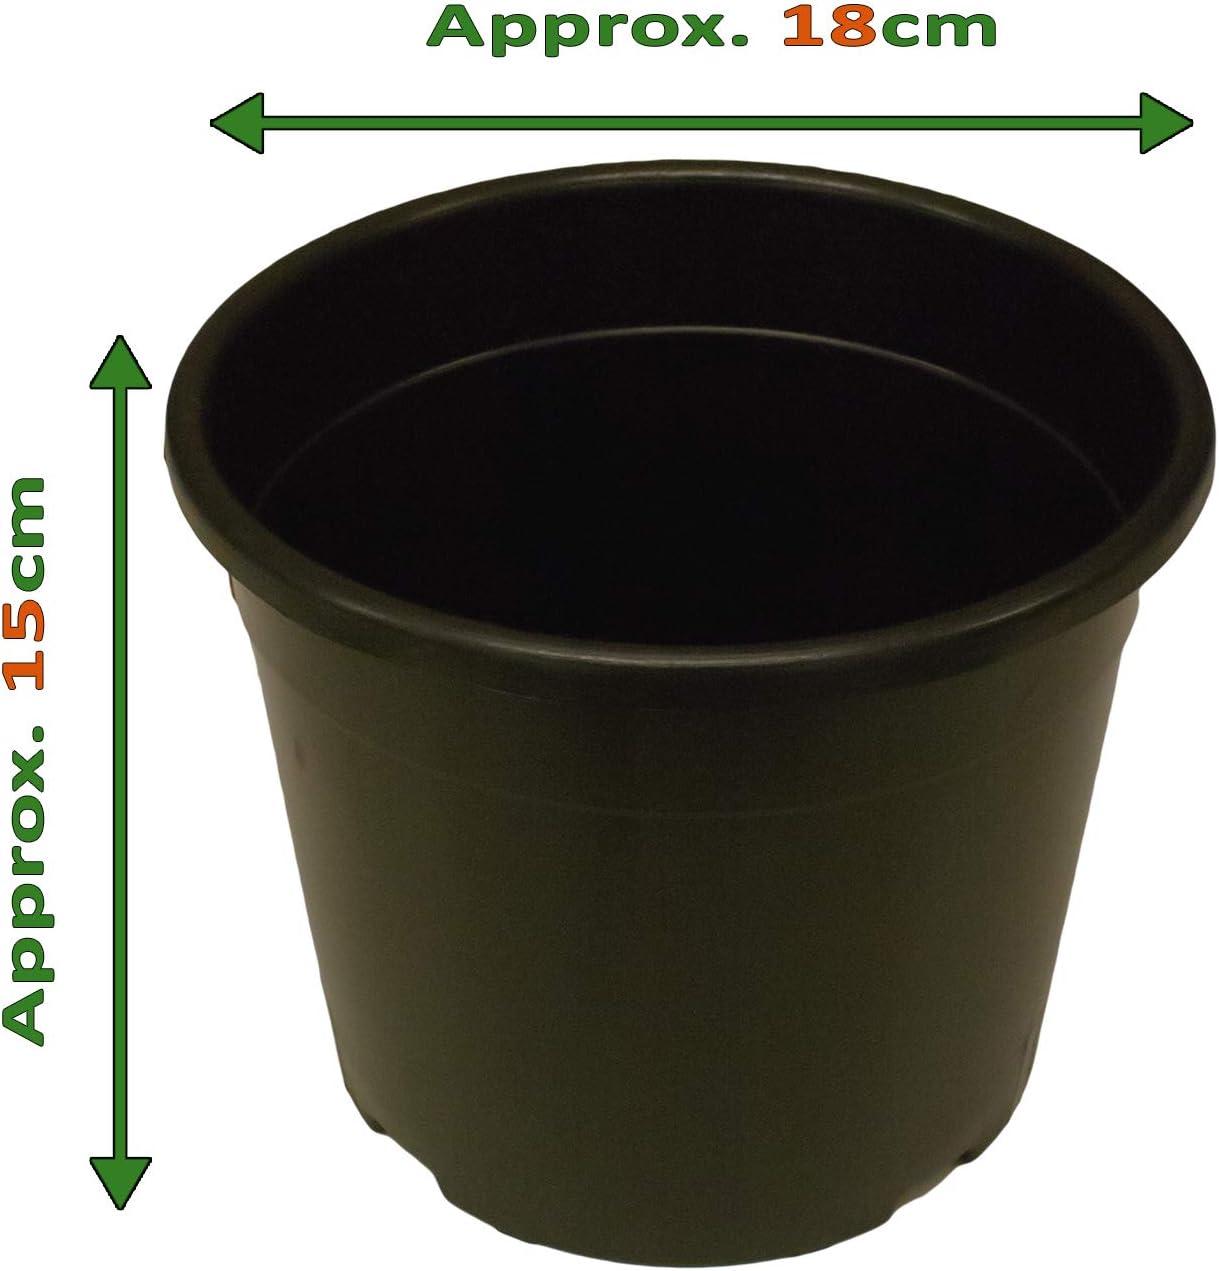 50 used 2 litre round black plastic plant // flower pots Medium Weight 16 cm